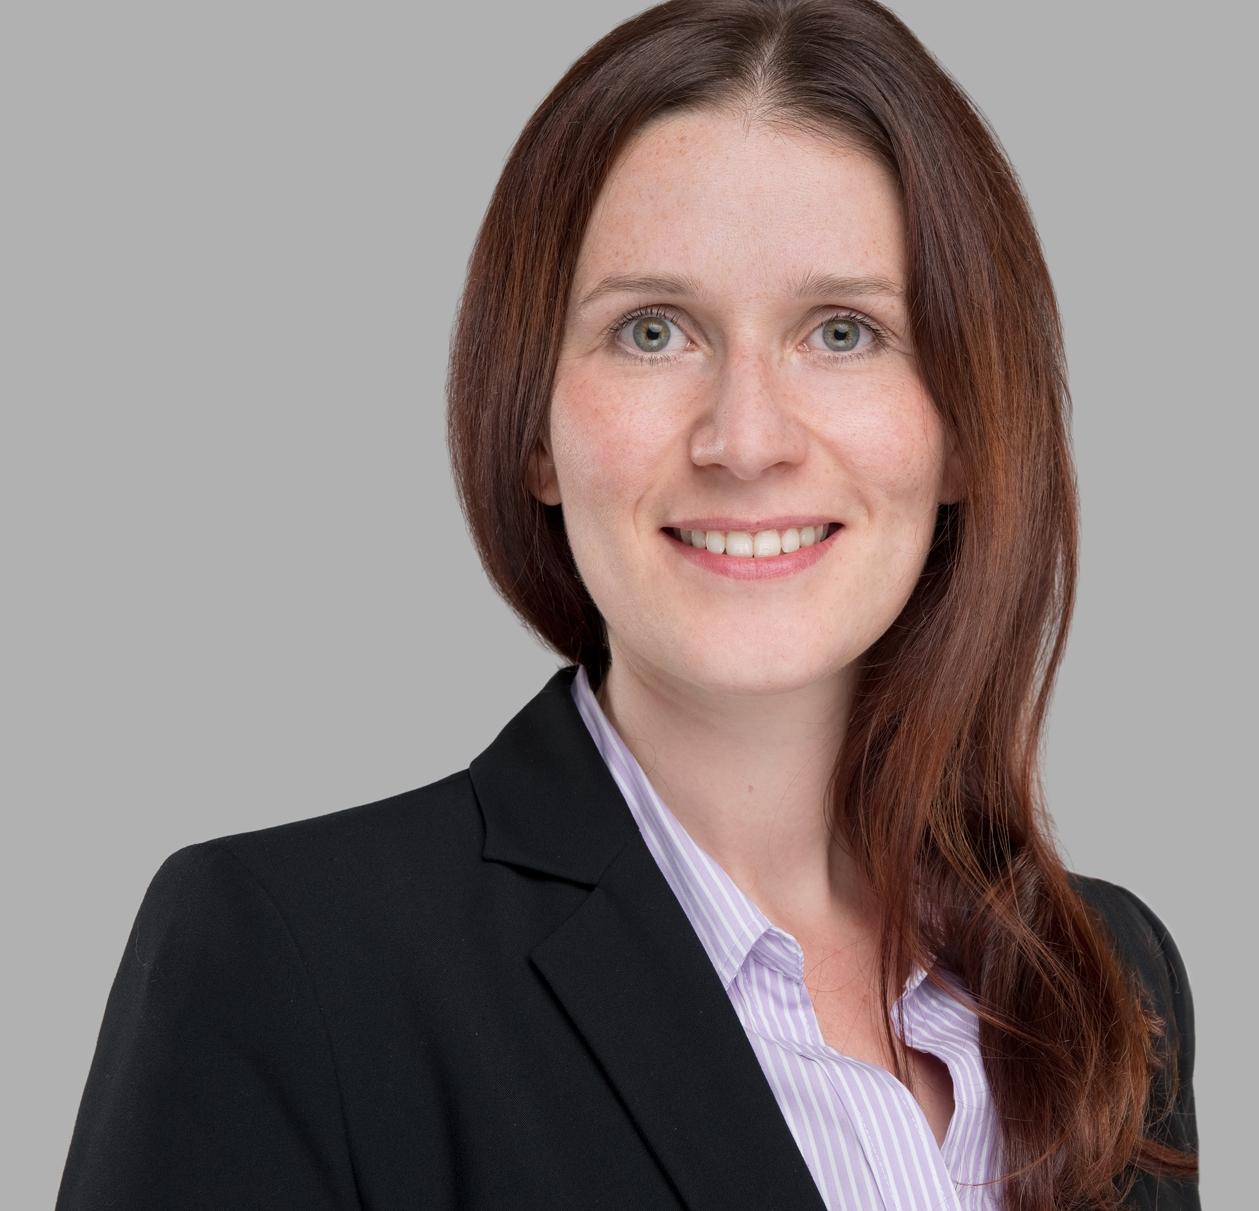 Prof. Dr. Anika Groß